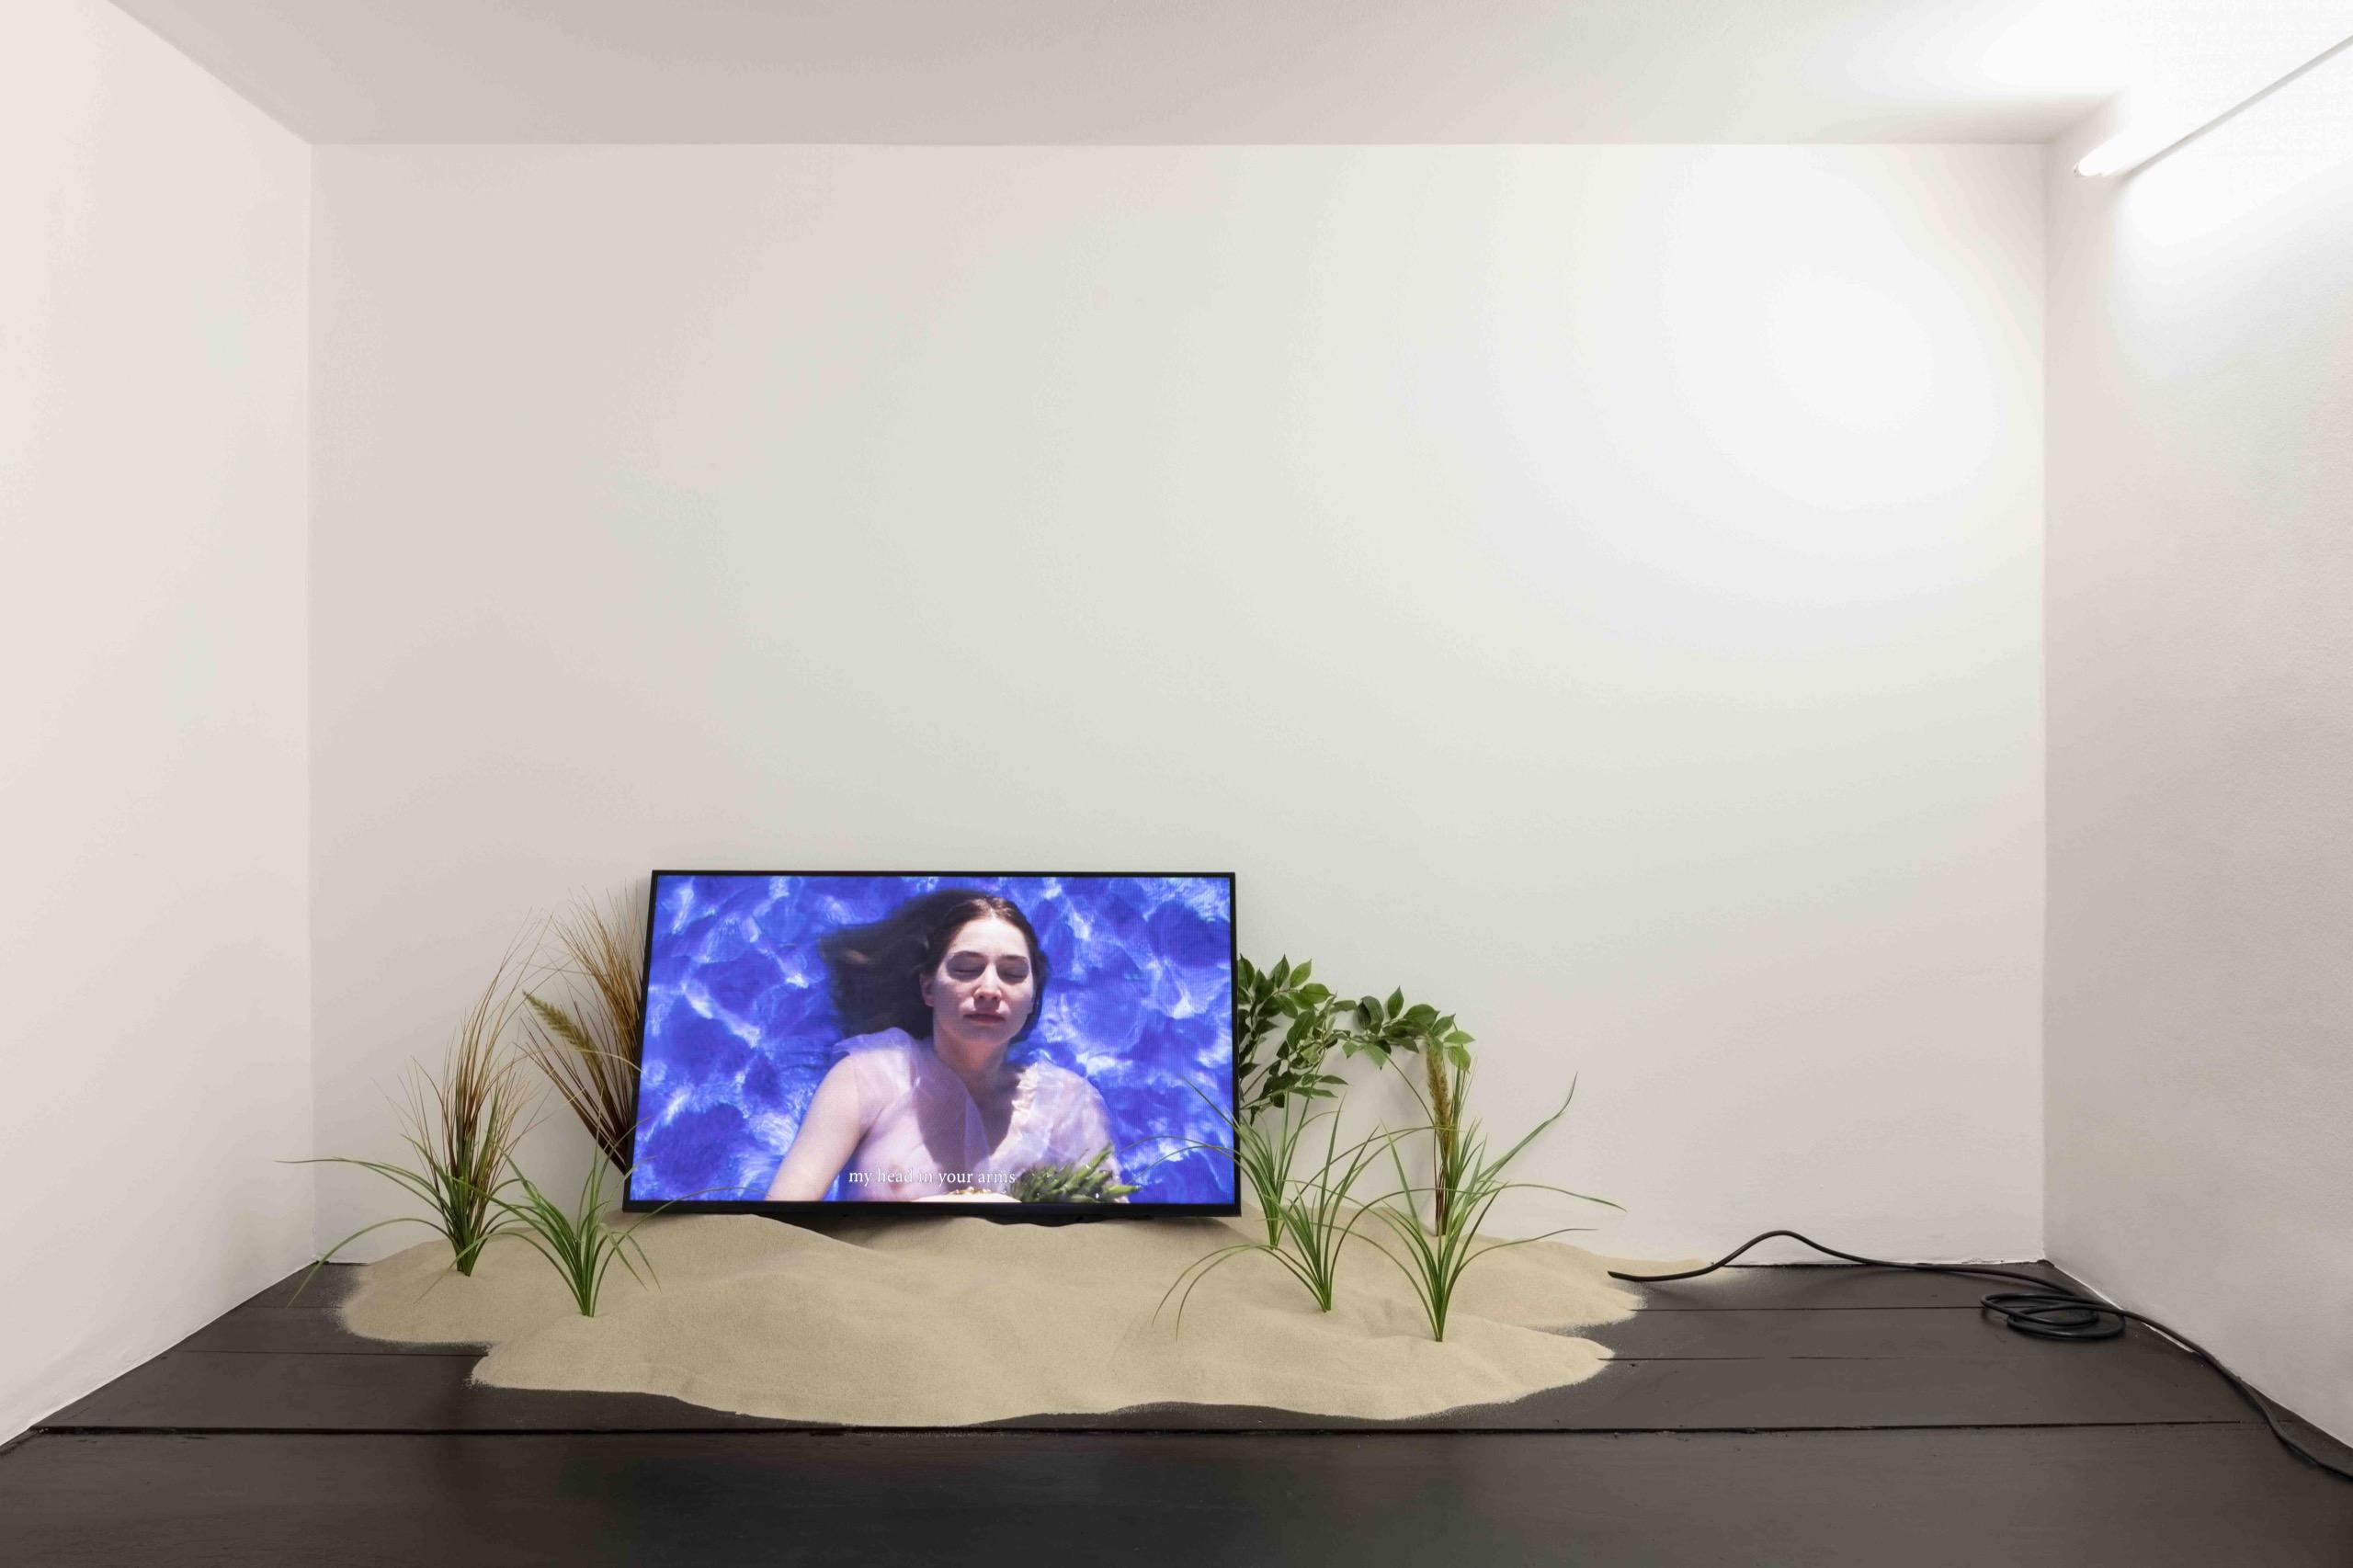 Juan Antonio Olivares, Kokomo Lost, 2016, CNC-milled EPS foam, sand, driftwood, artificial foliage, LED monitor, media player, external speaker, HD video, 7:08